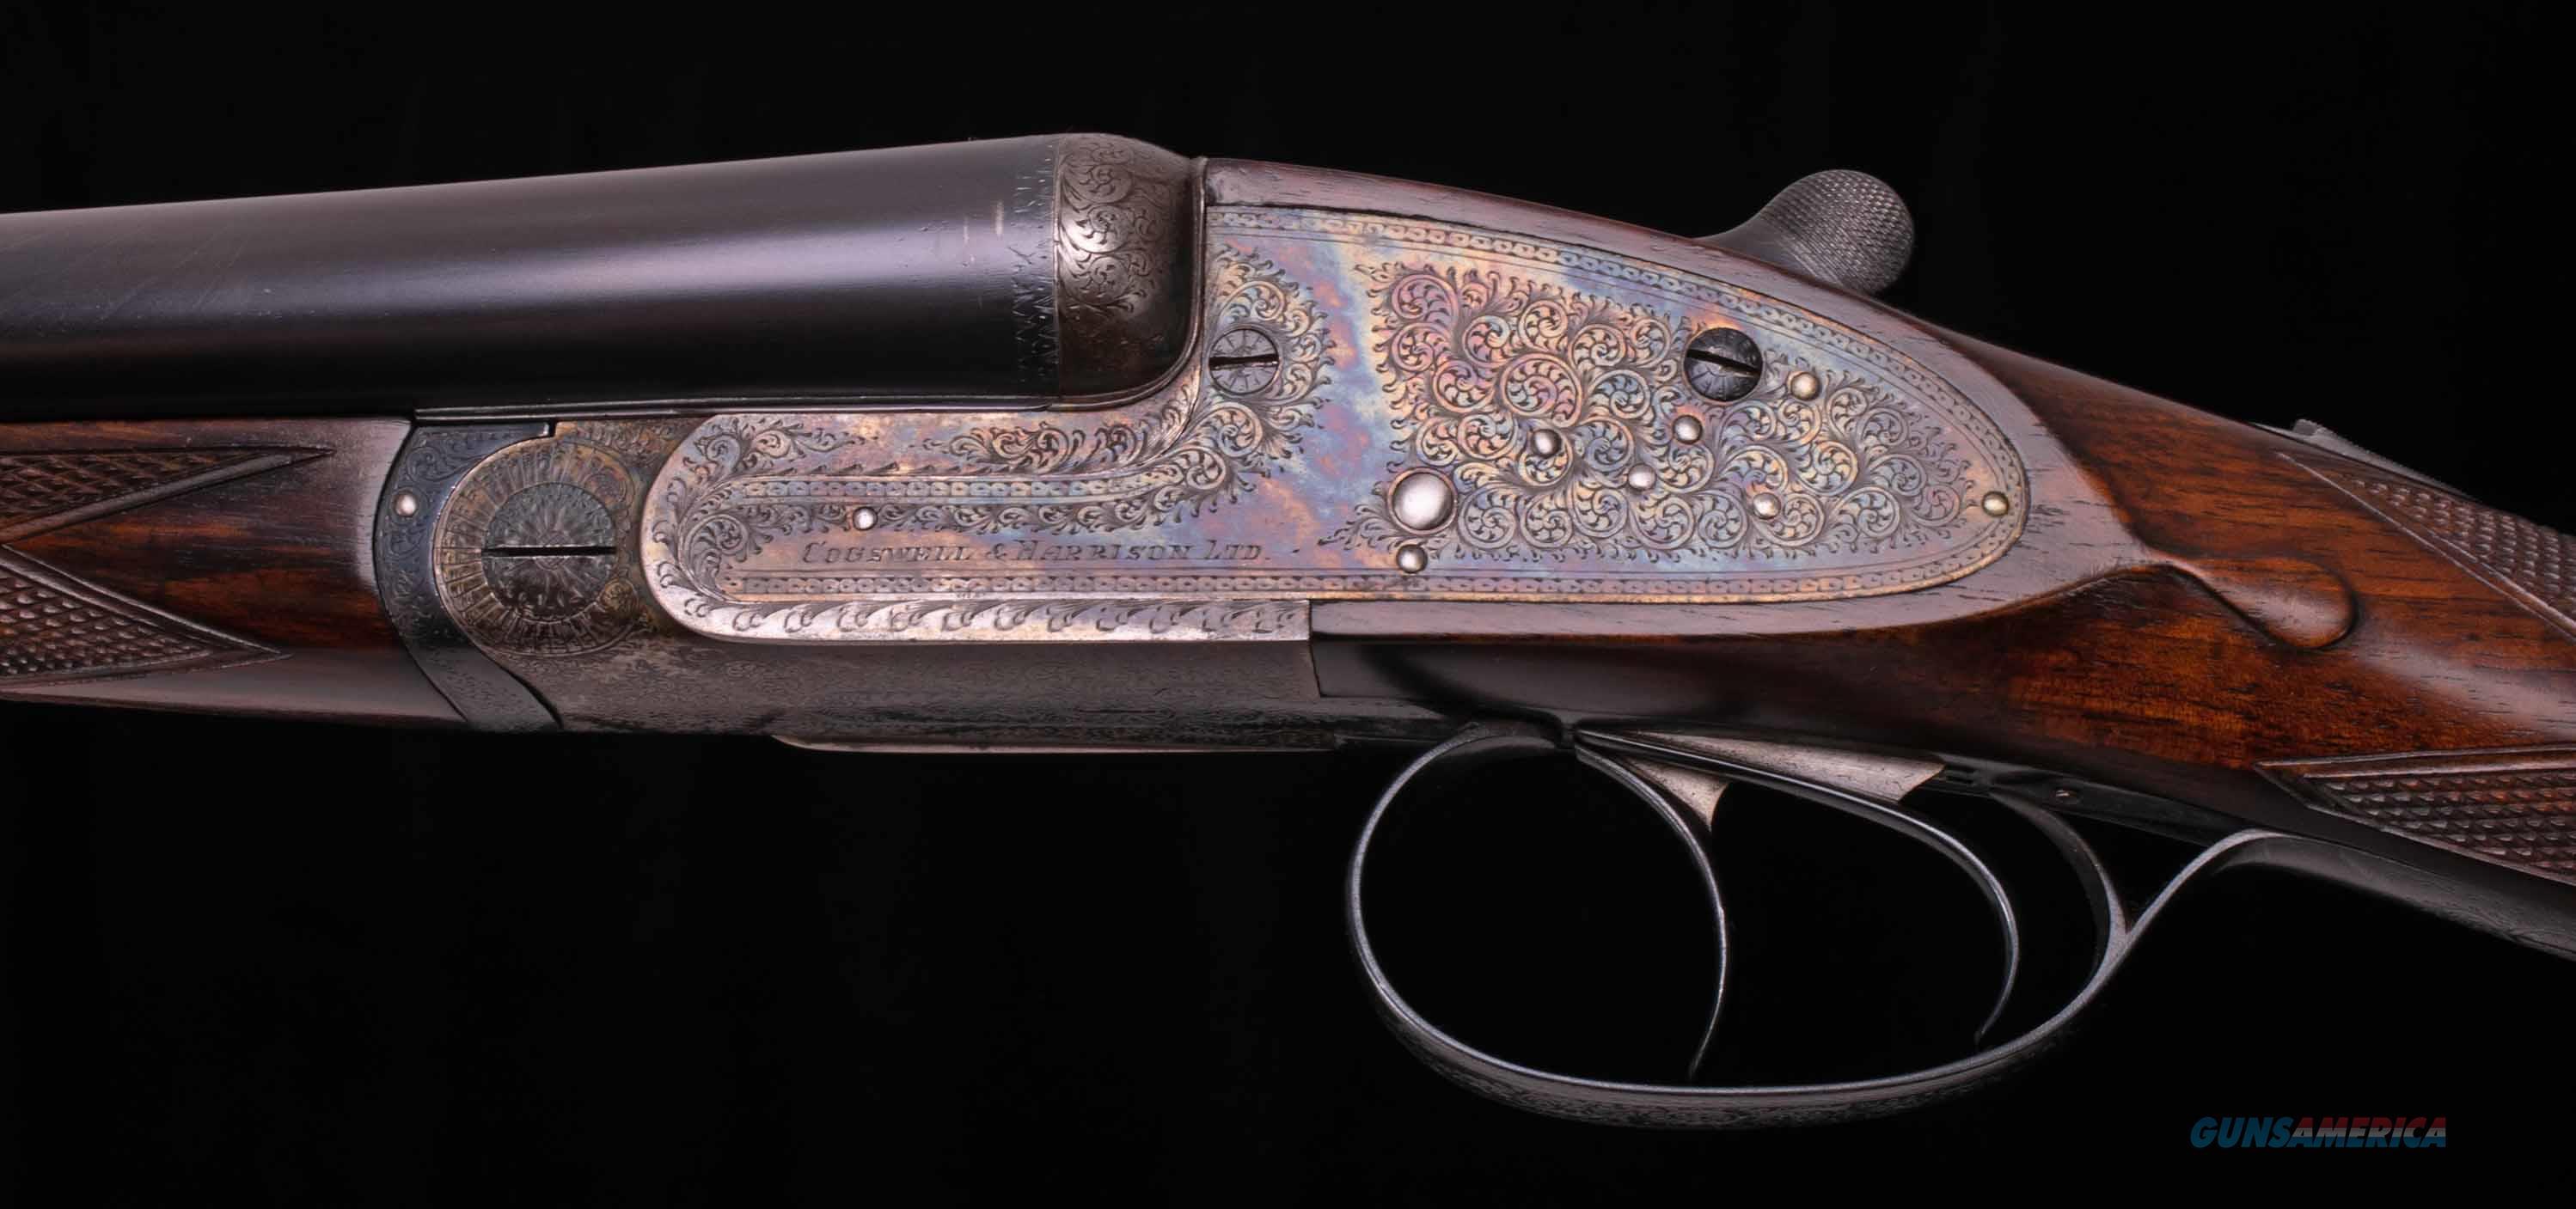 Cogswell & Harrison 20 Bore – LONDON SIDELOCK, CASED, 98%, 5LBS. 10oz., vintage firearms inc  Guns > Shotguns > Double Shotguns (Misc.)  > English